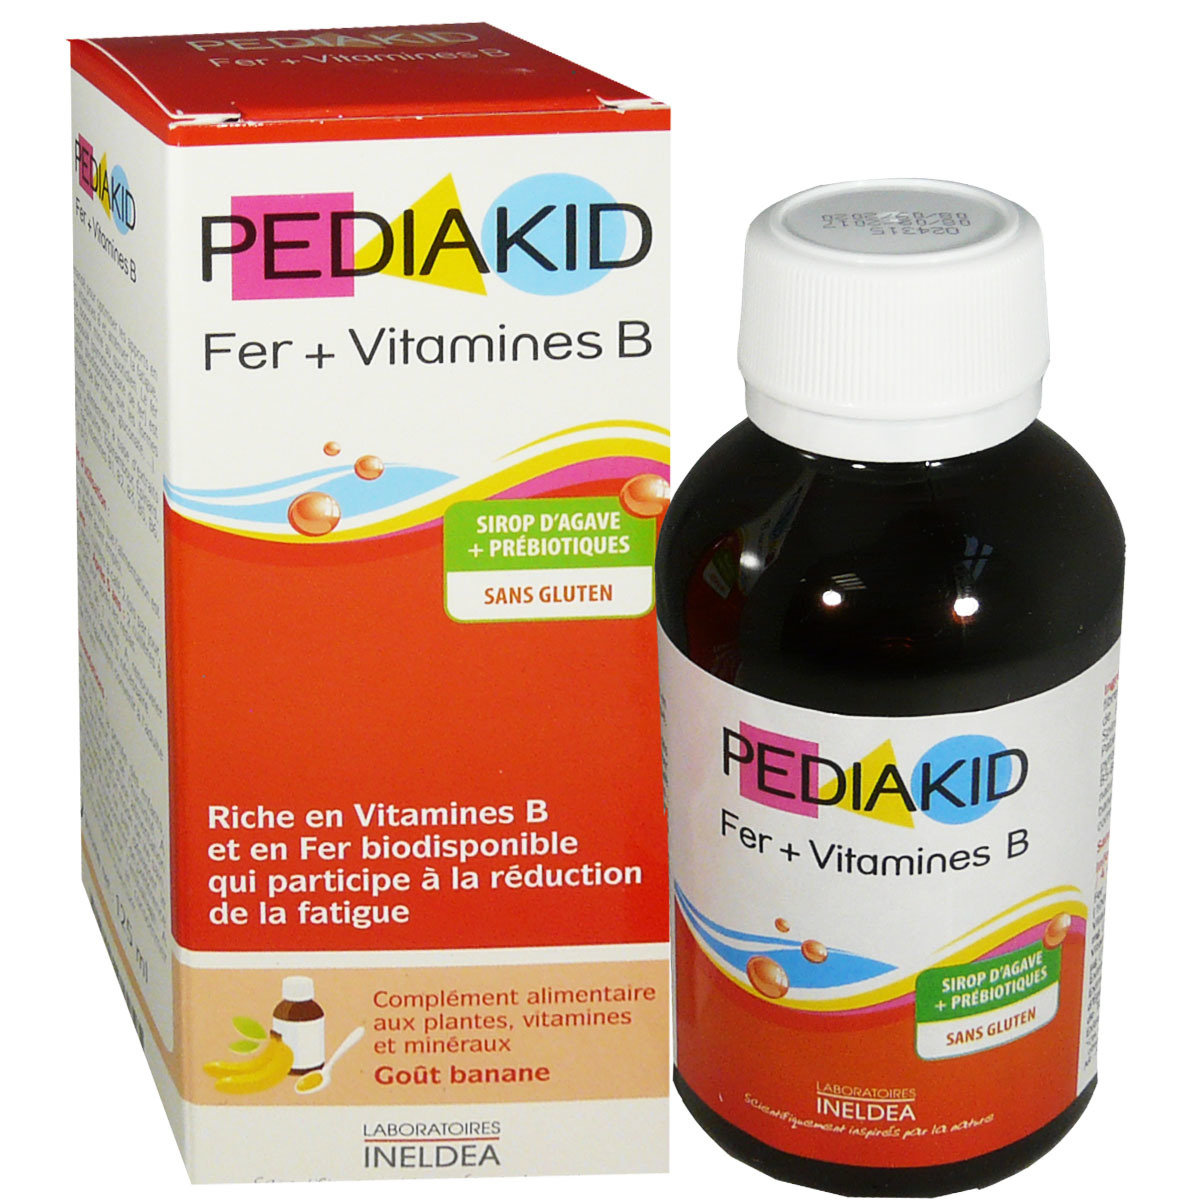 Le sirop Fer vitamine B PEDIAKID discount inspiré par